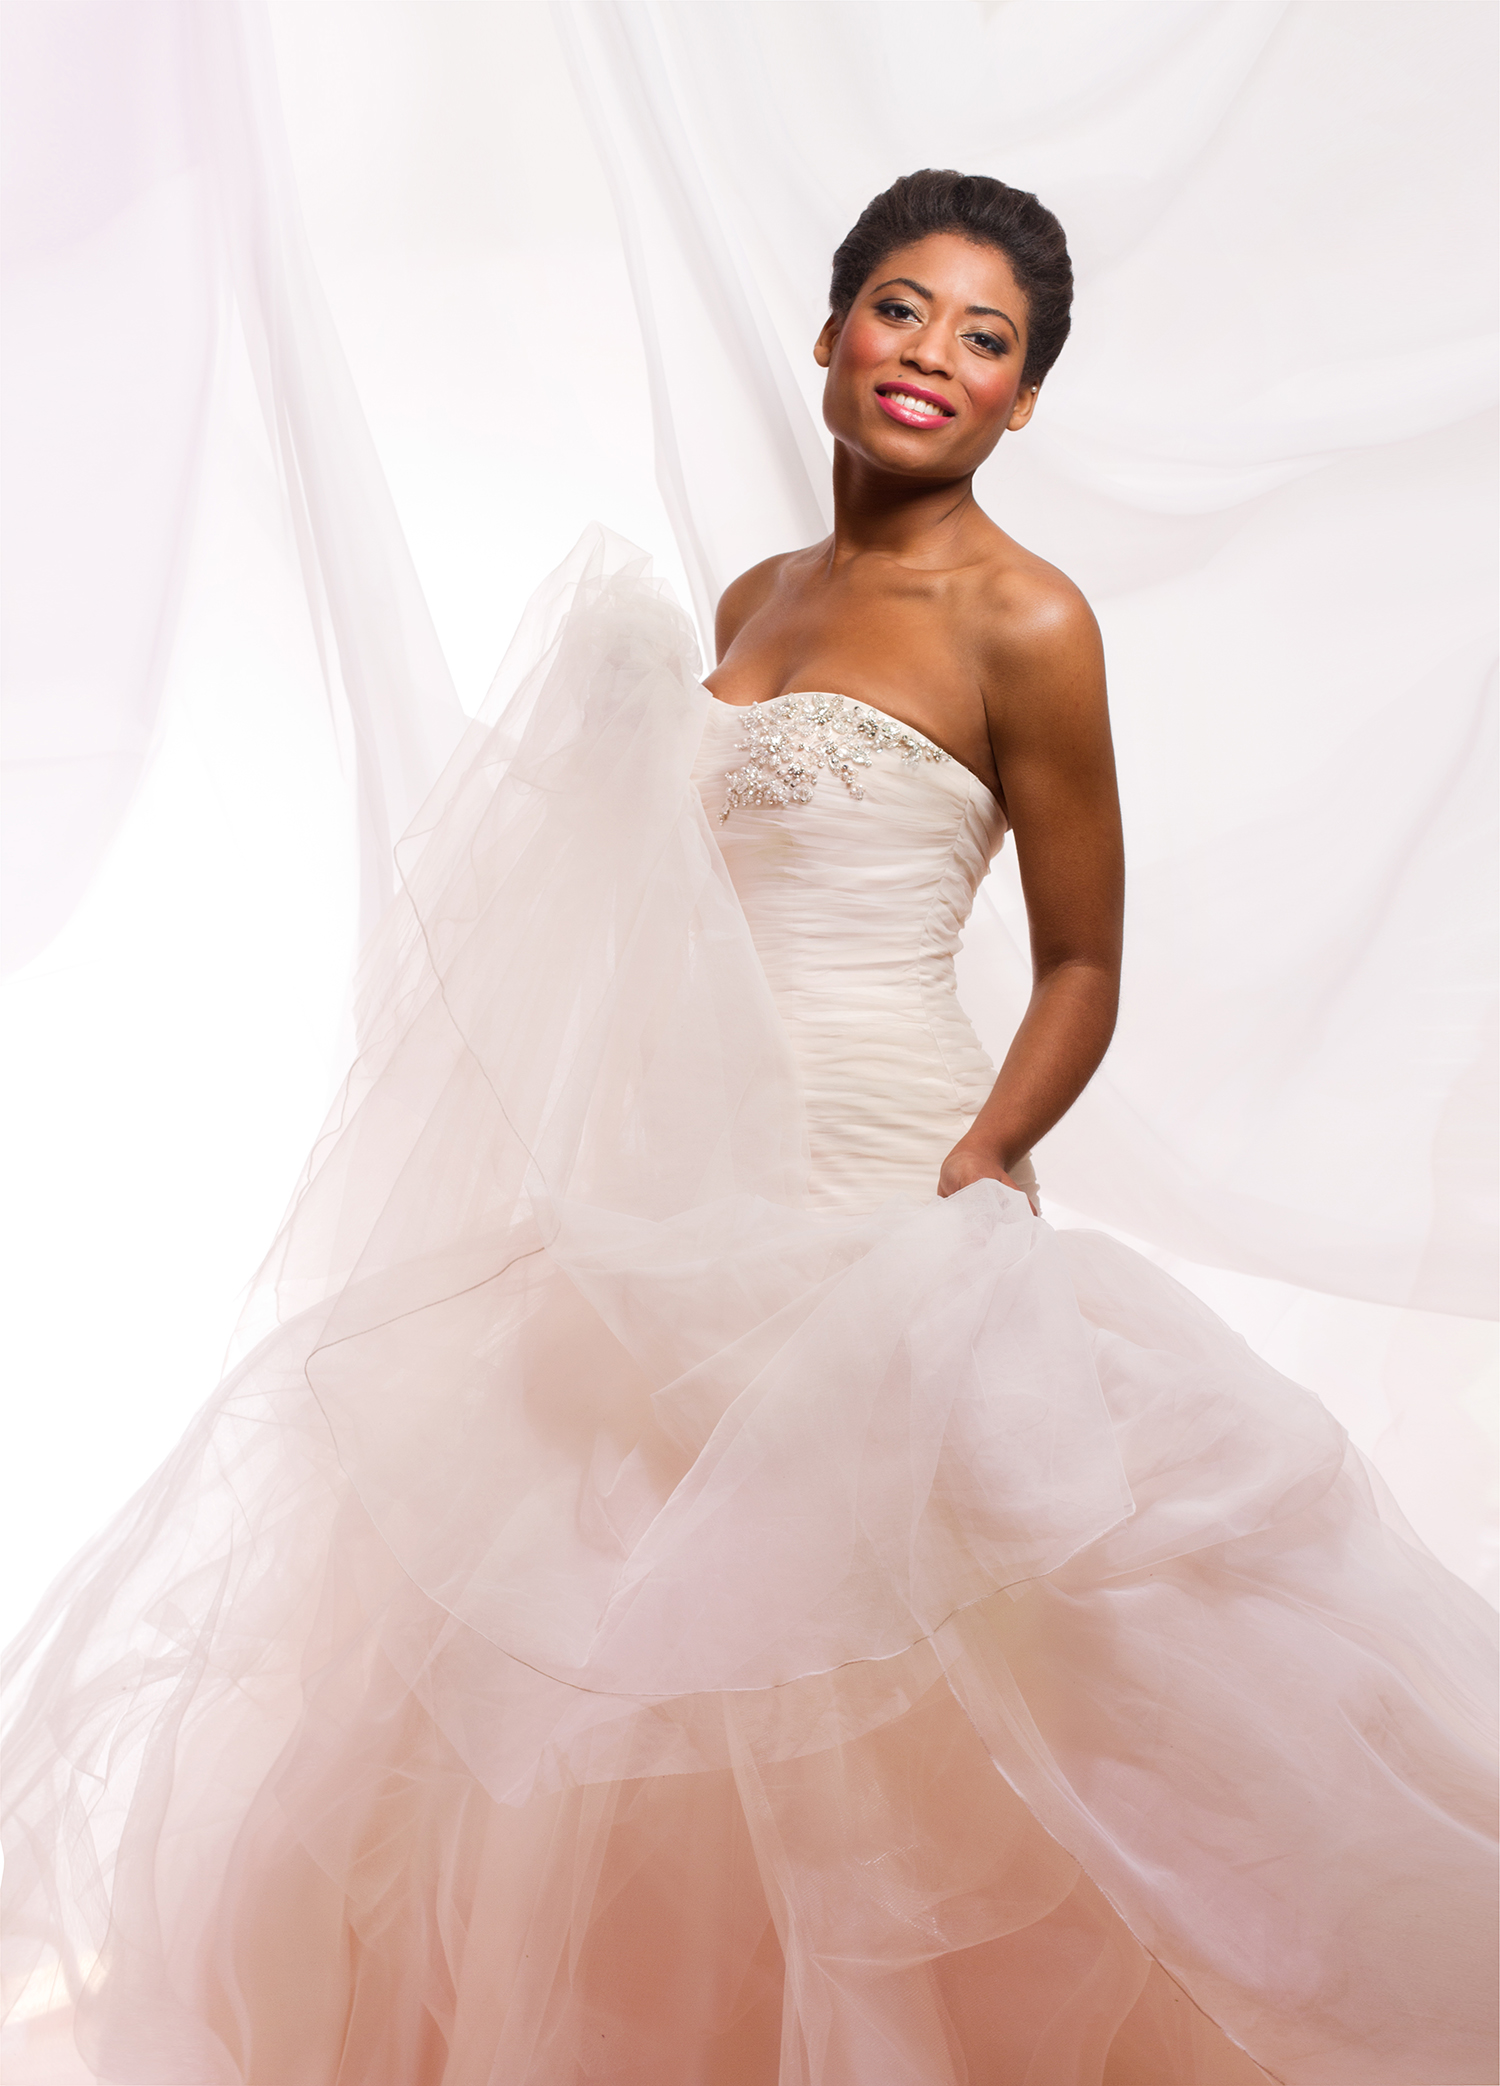 BridalBeauty_MichelleGirardPhotography02.jpg